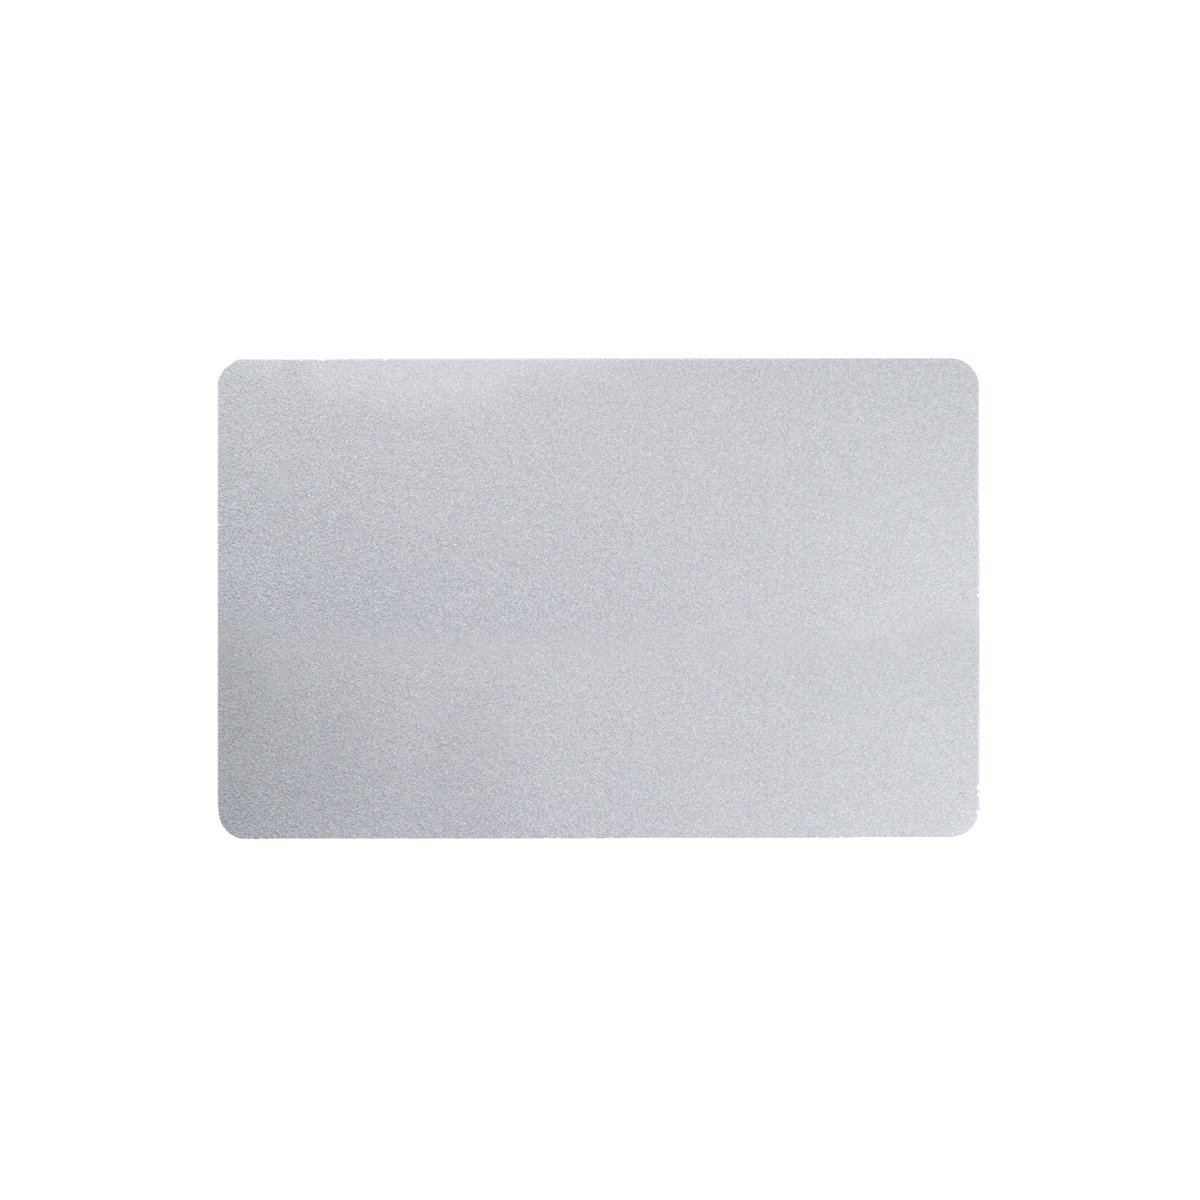 Karten, Zebra Premier Colour PVC, silber metallic, 30 mil